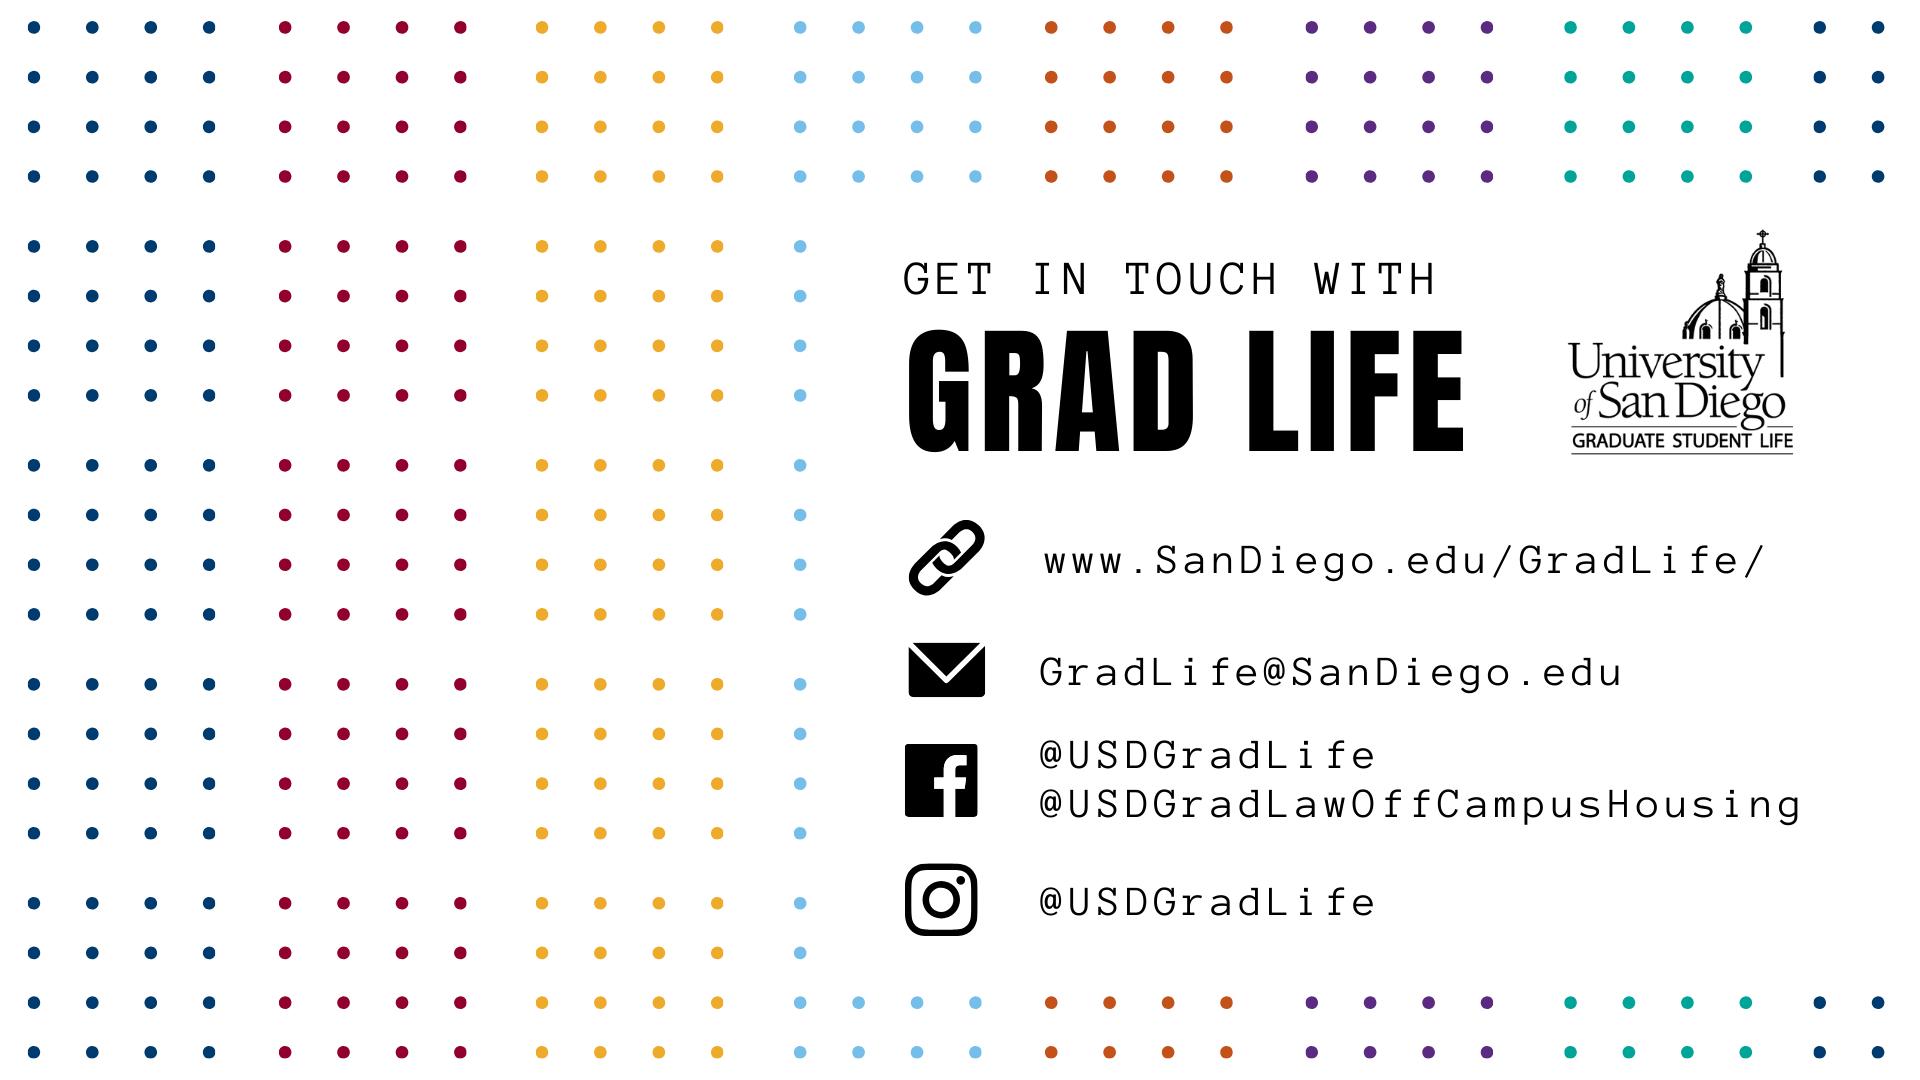 Contact Graduate Student Life